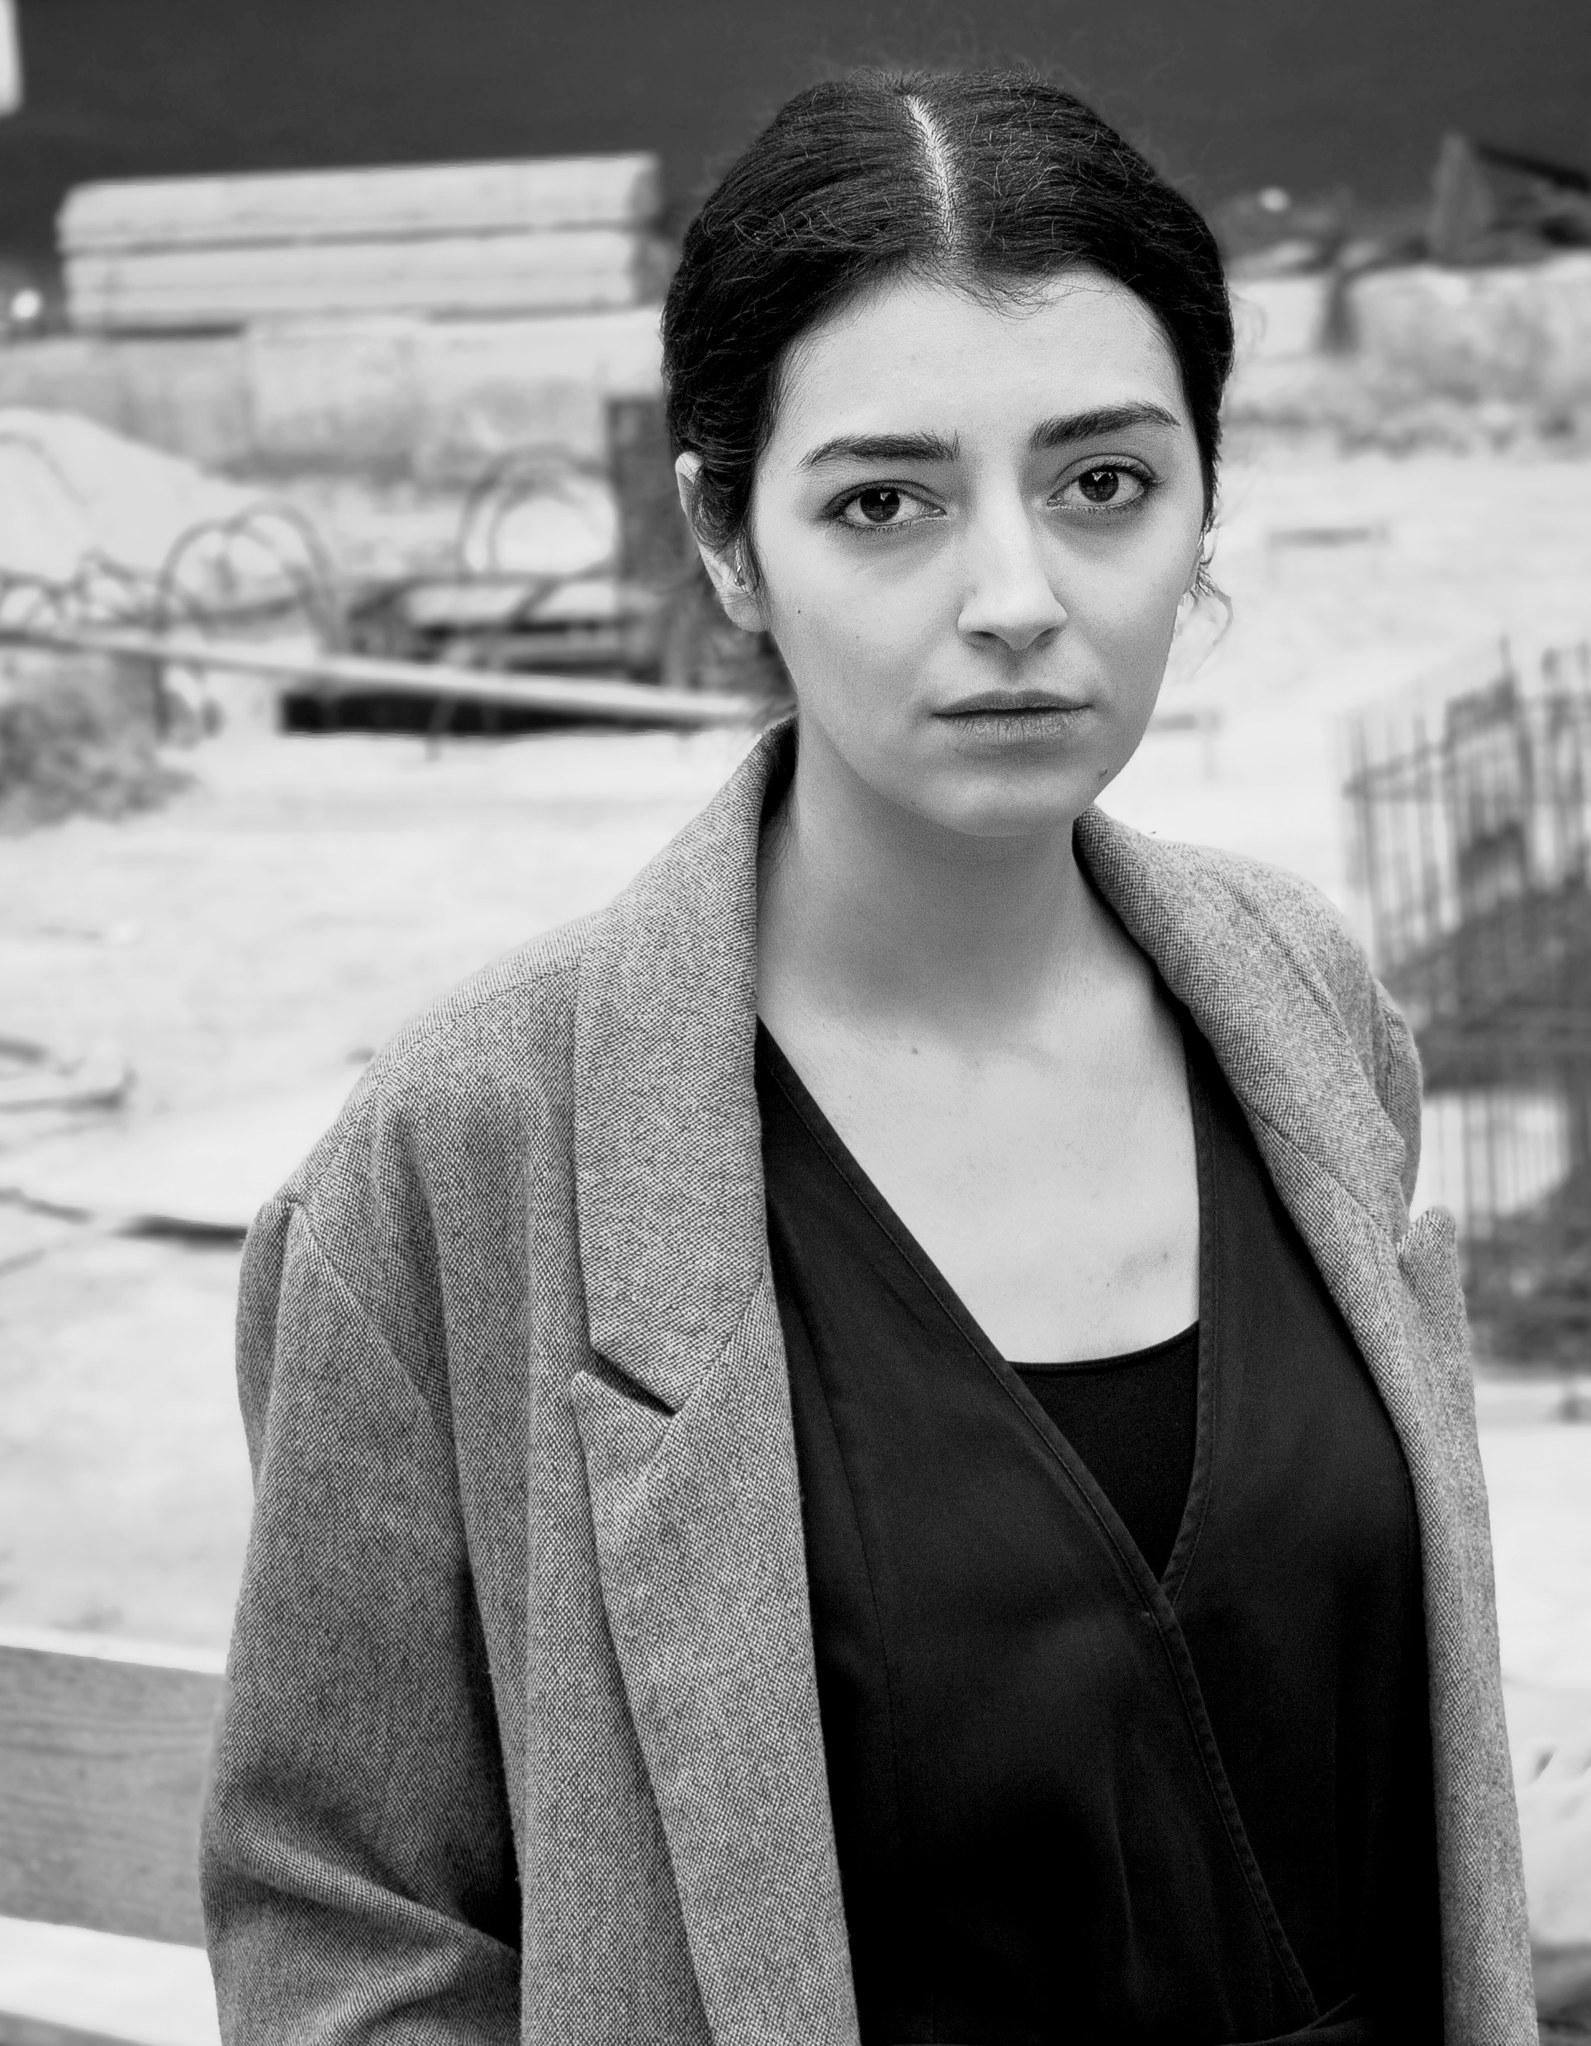 Portrait Elmira Iravanizad © Cyrus Mahboubian